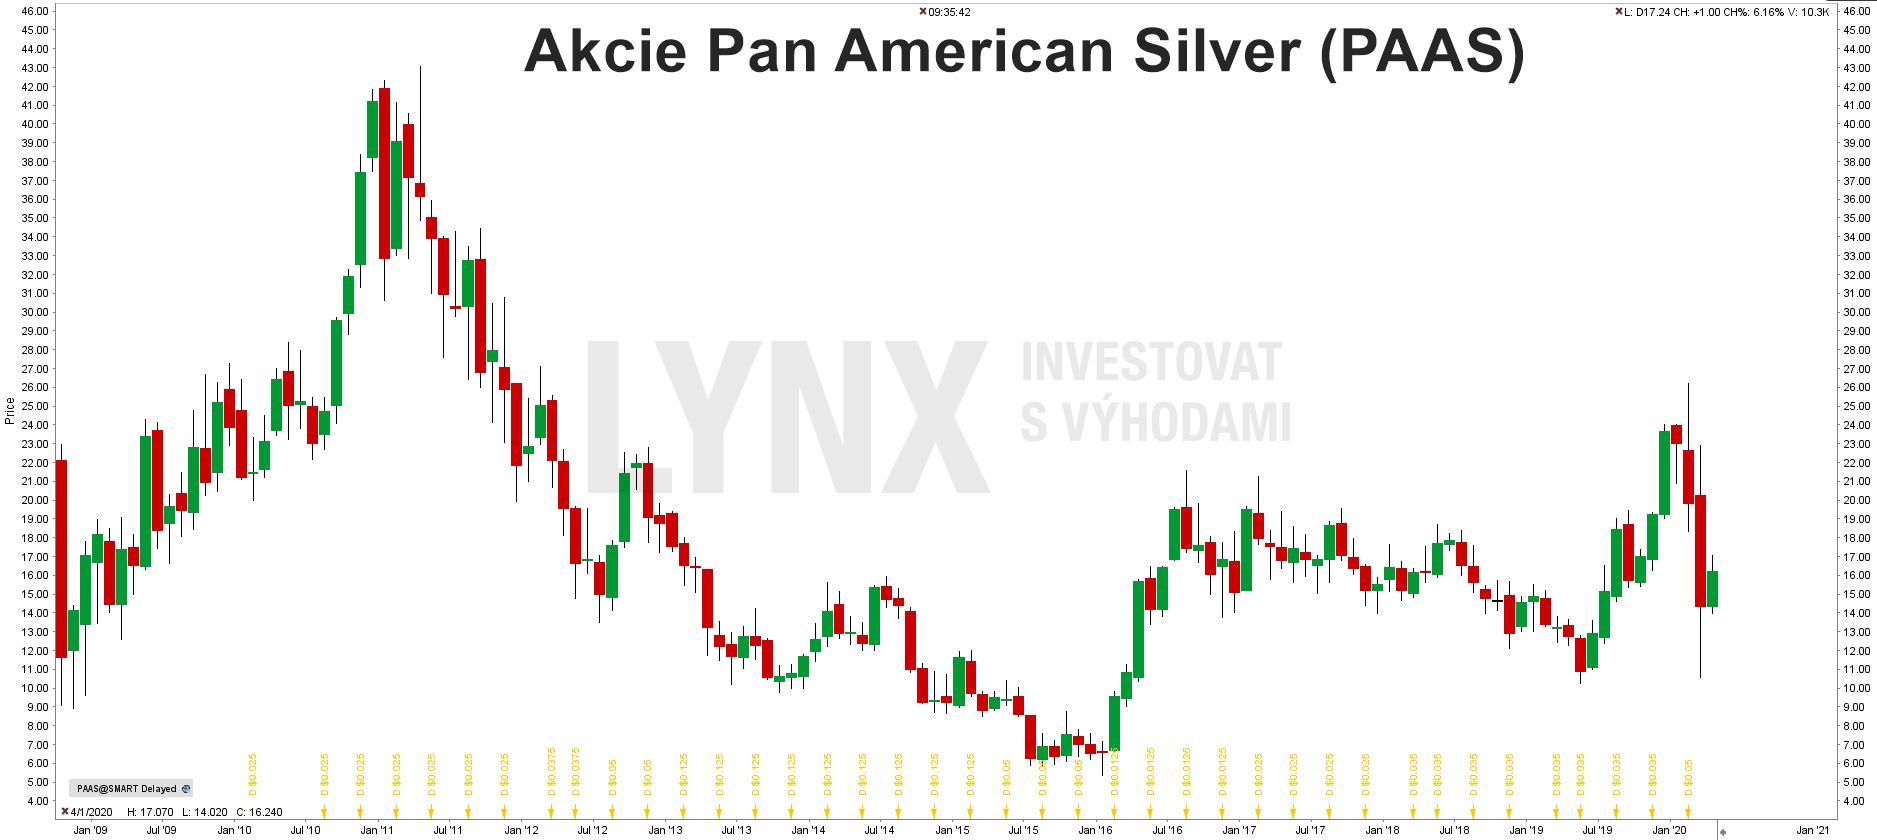 Grafakcie Pan American Silver (PAAS)